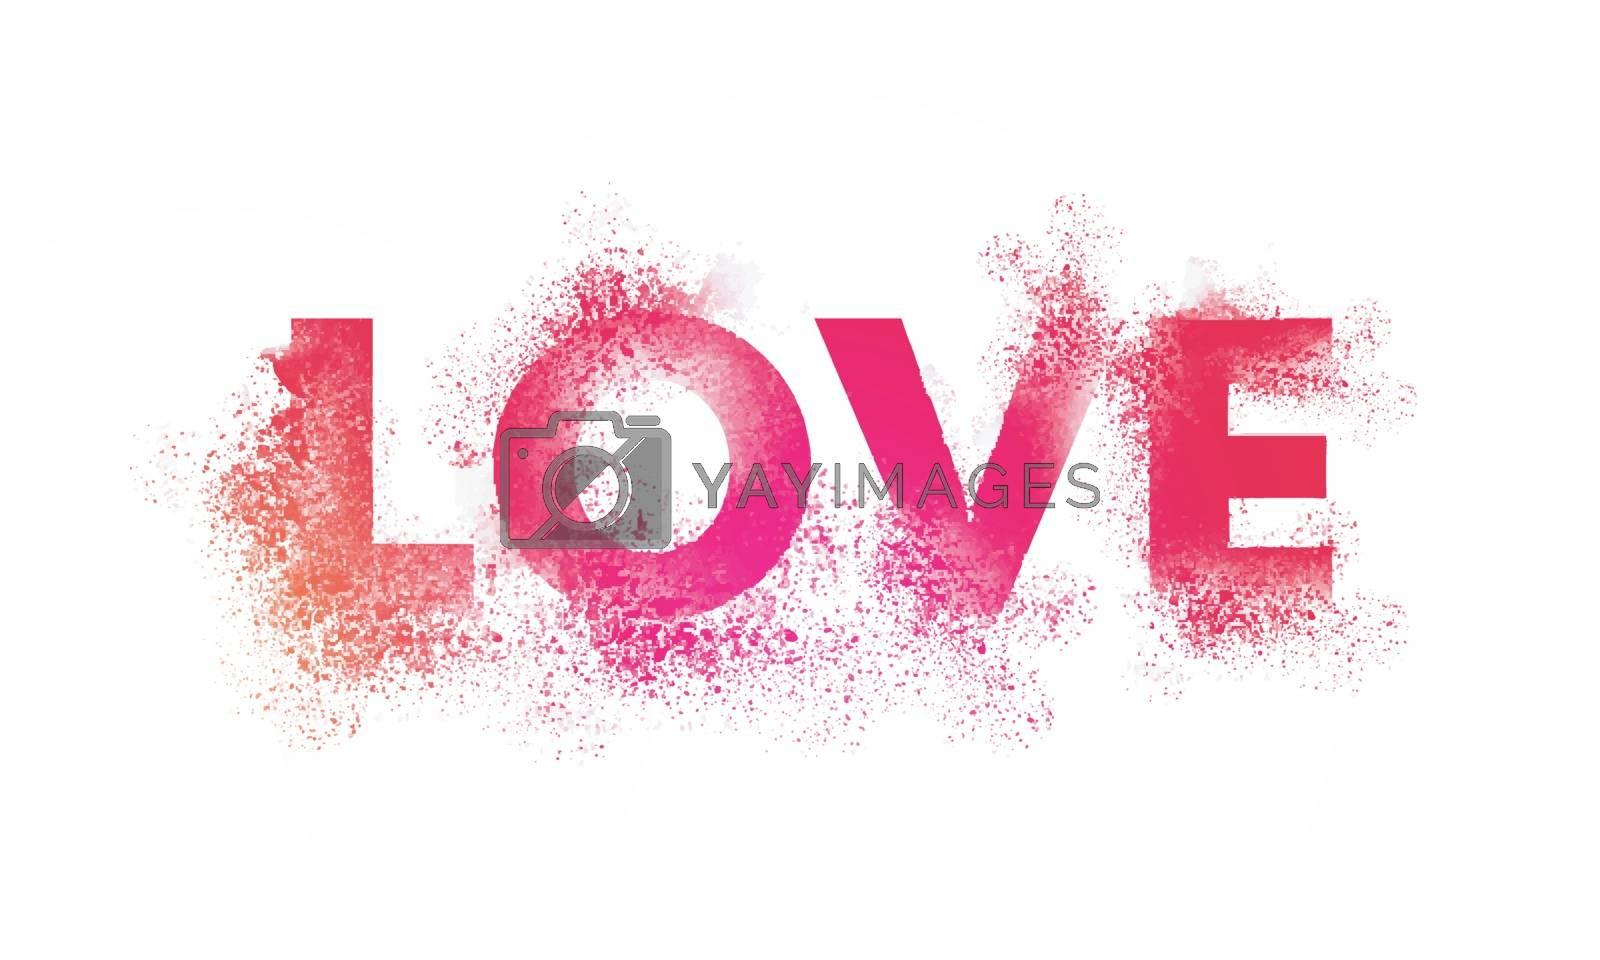 Stylish Text Love with splash for Happy Valentine's Day Celebration.